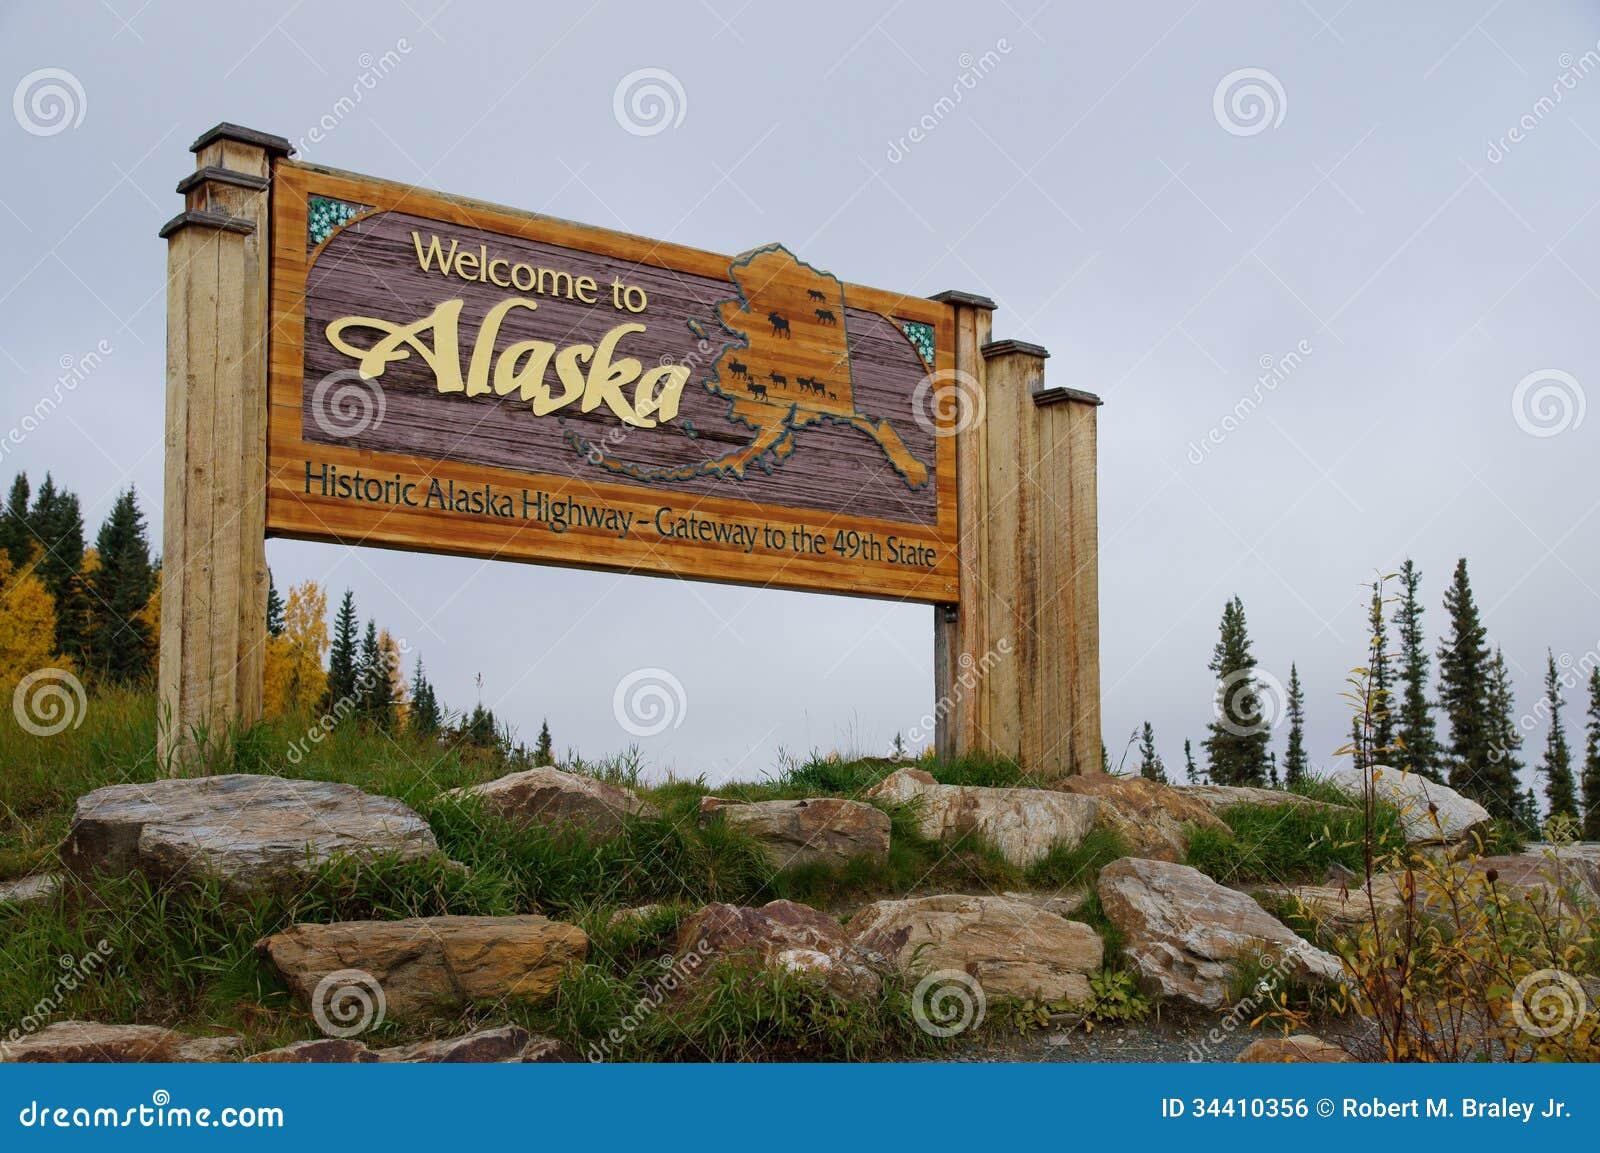 Download Welcome to Alaska stock photo. Image of alaska, gateway - 34410356